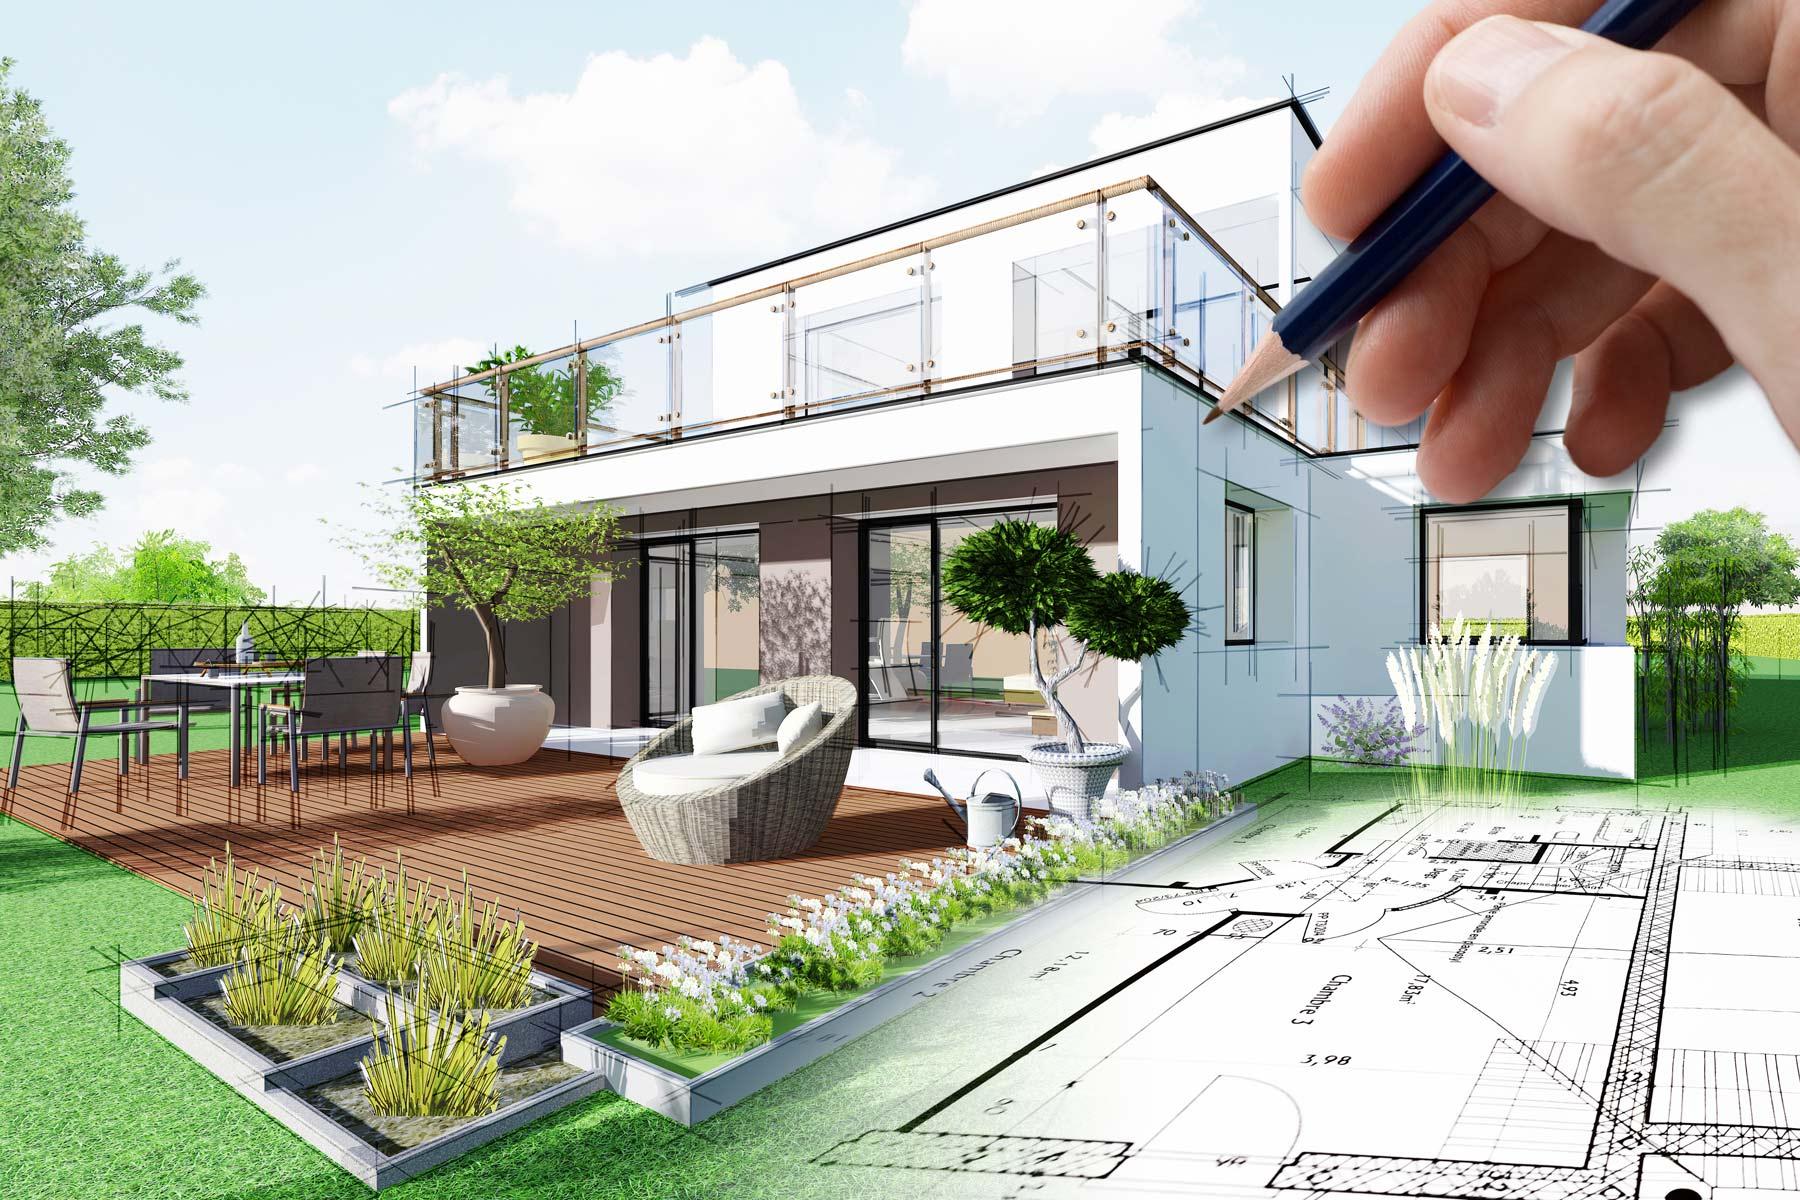 Merz-Immobilien-Rottweil-Bauprojekte